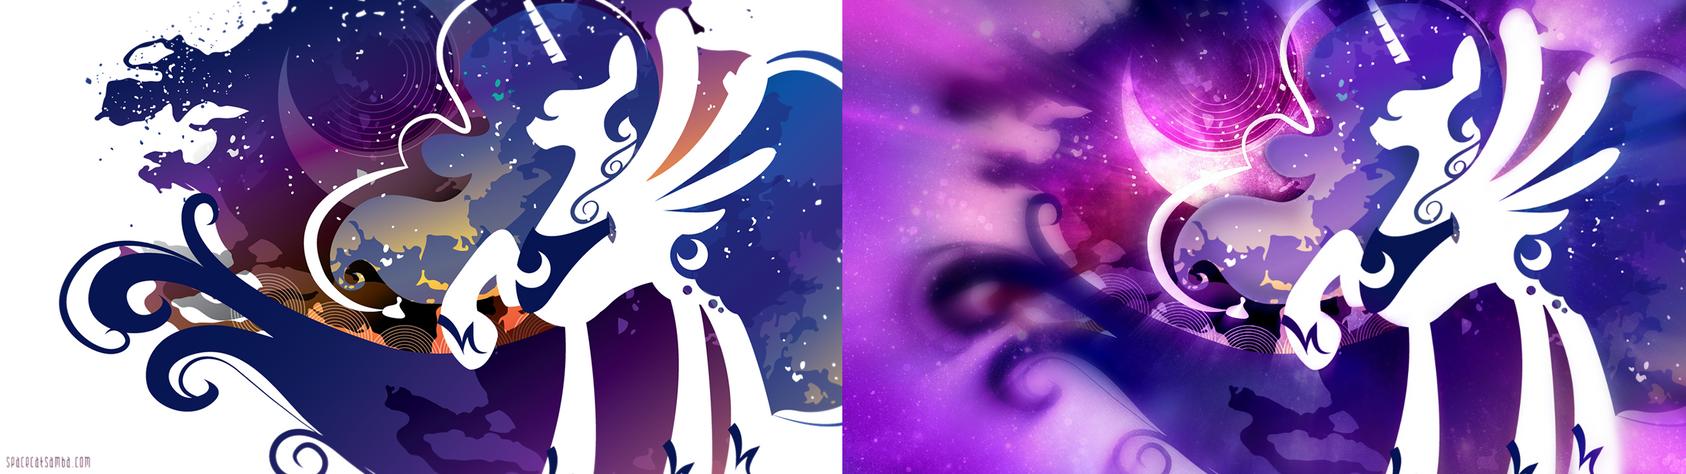 Princess Luna Light Silhouette Wall Edited by ConnieTheCasanova